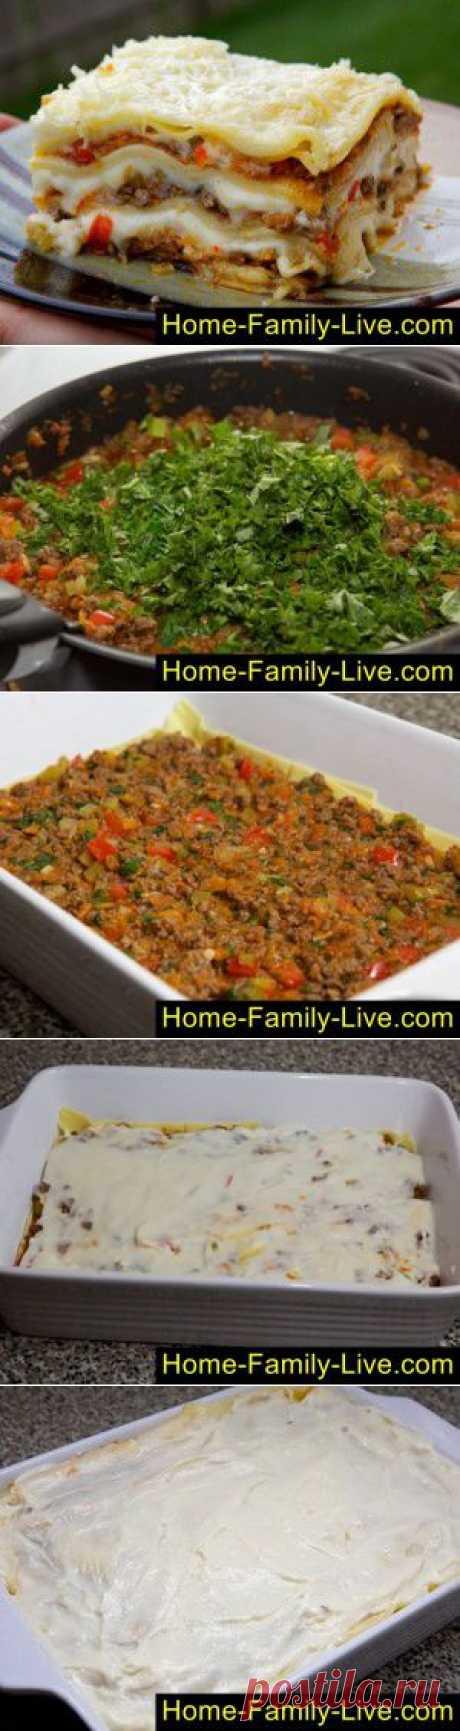 Лазанья мясная - пошаговый фоторецепт - итальянская кухня